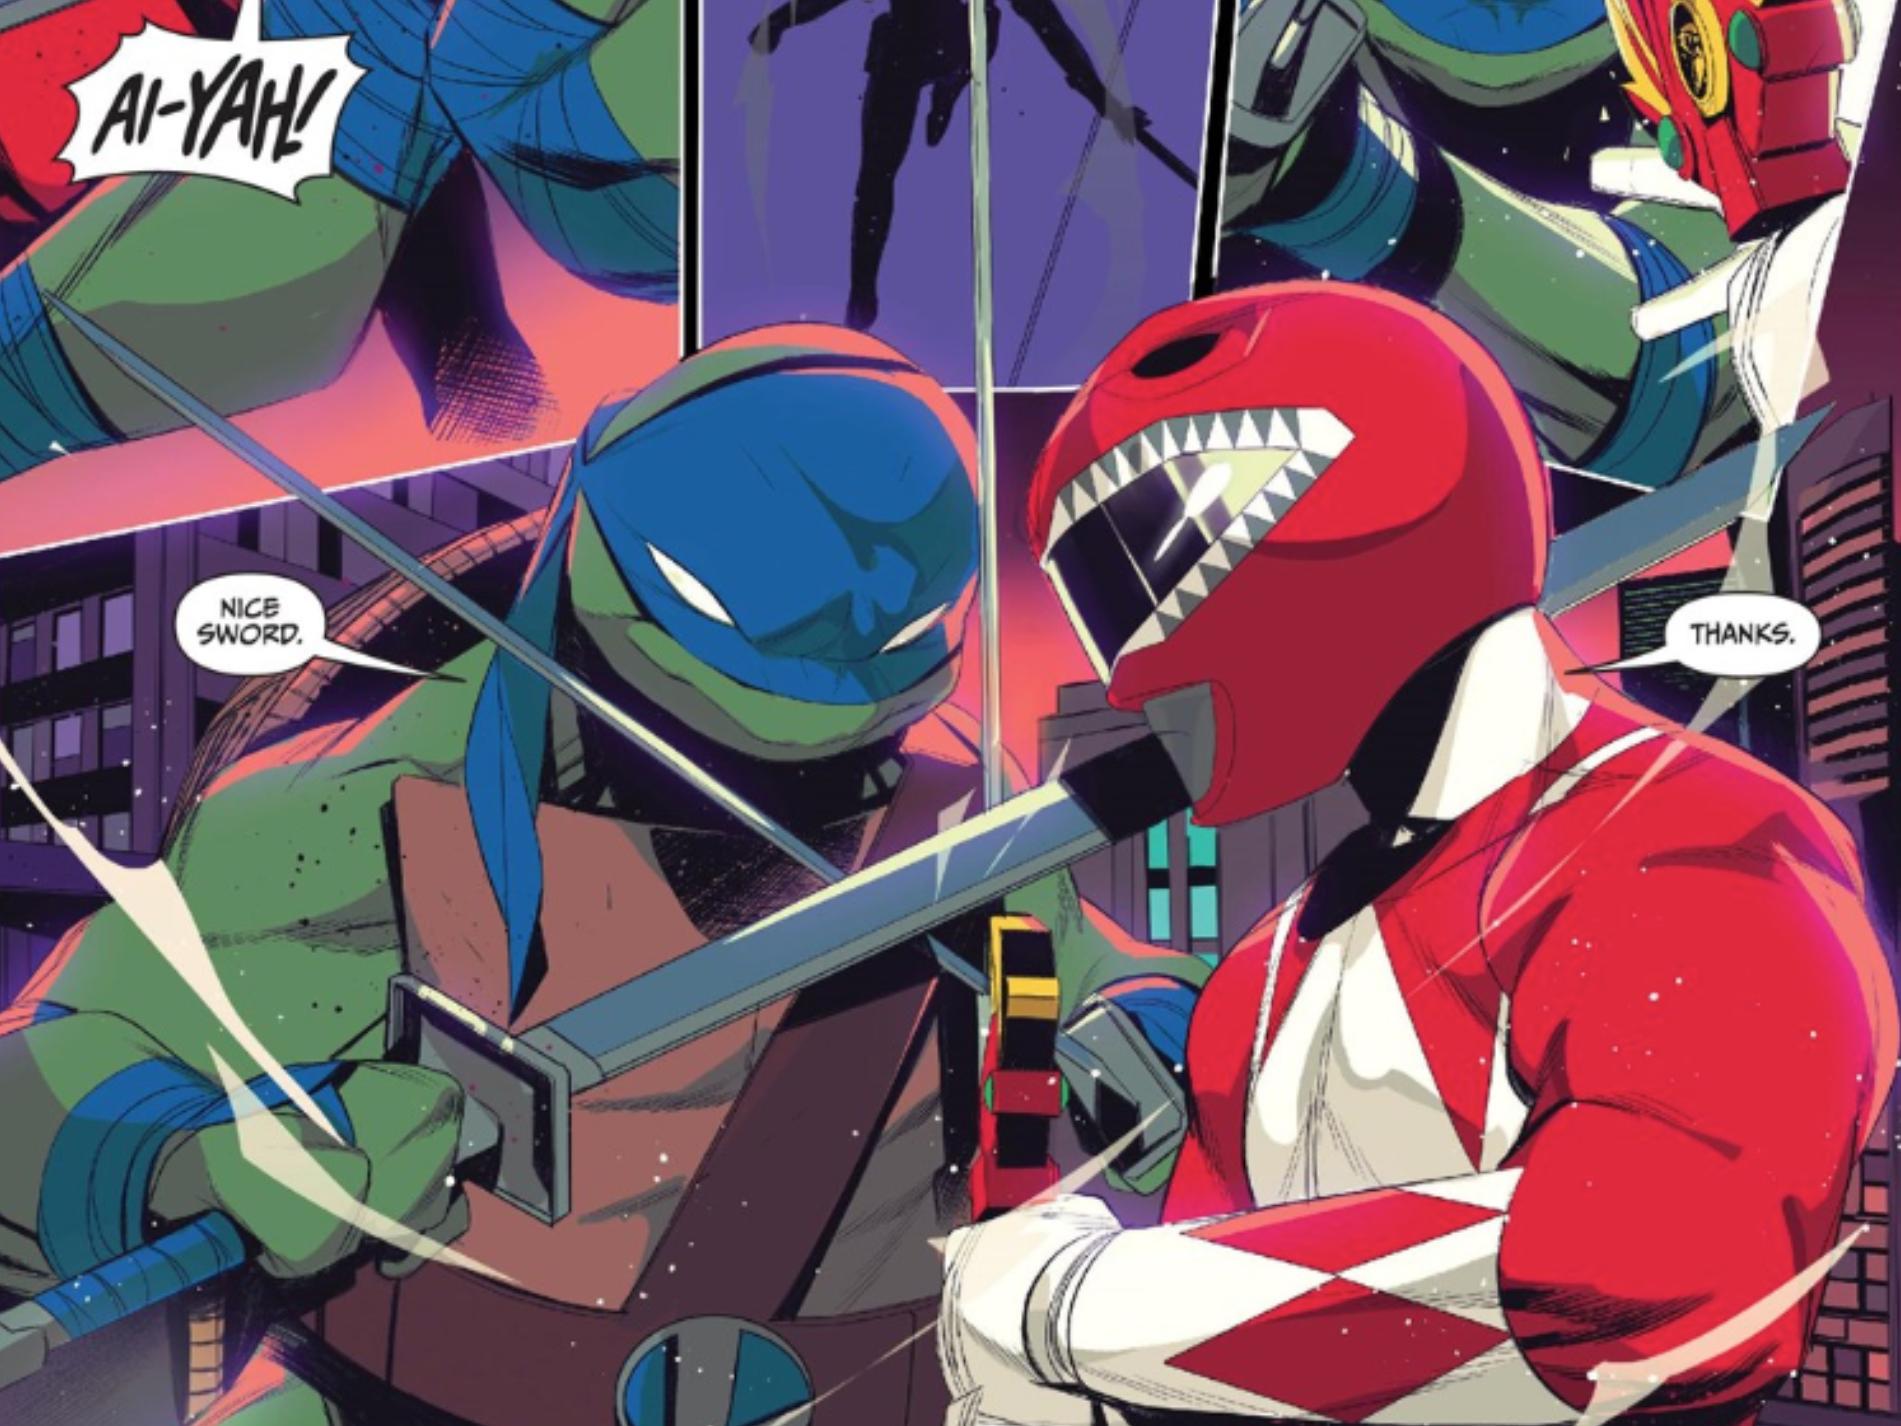 Mighty Morphin Power Rangers, Teenage Mutant Ninja Turtles, Graphic Novel Explorers Club, Comic Book Podcast, Graphic Novel Podcast